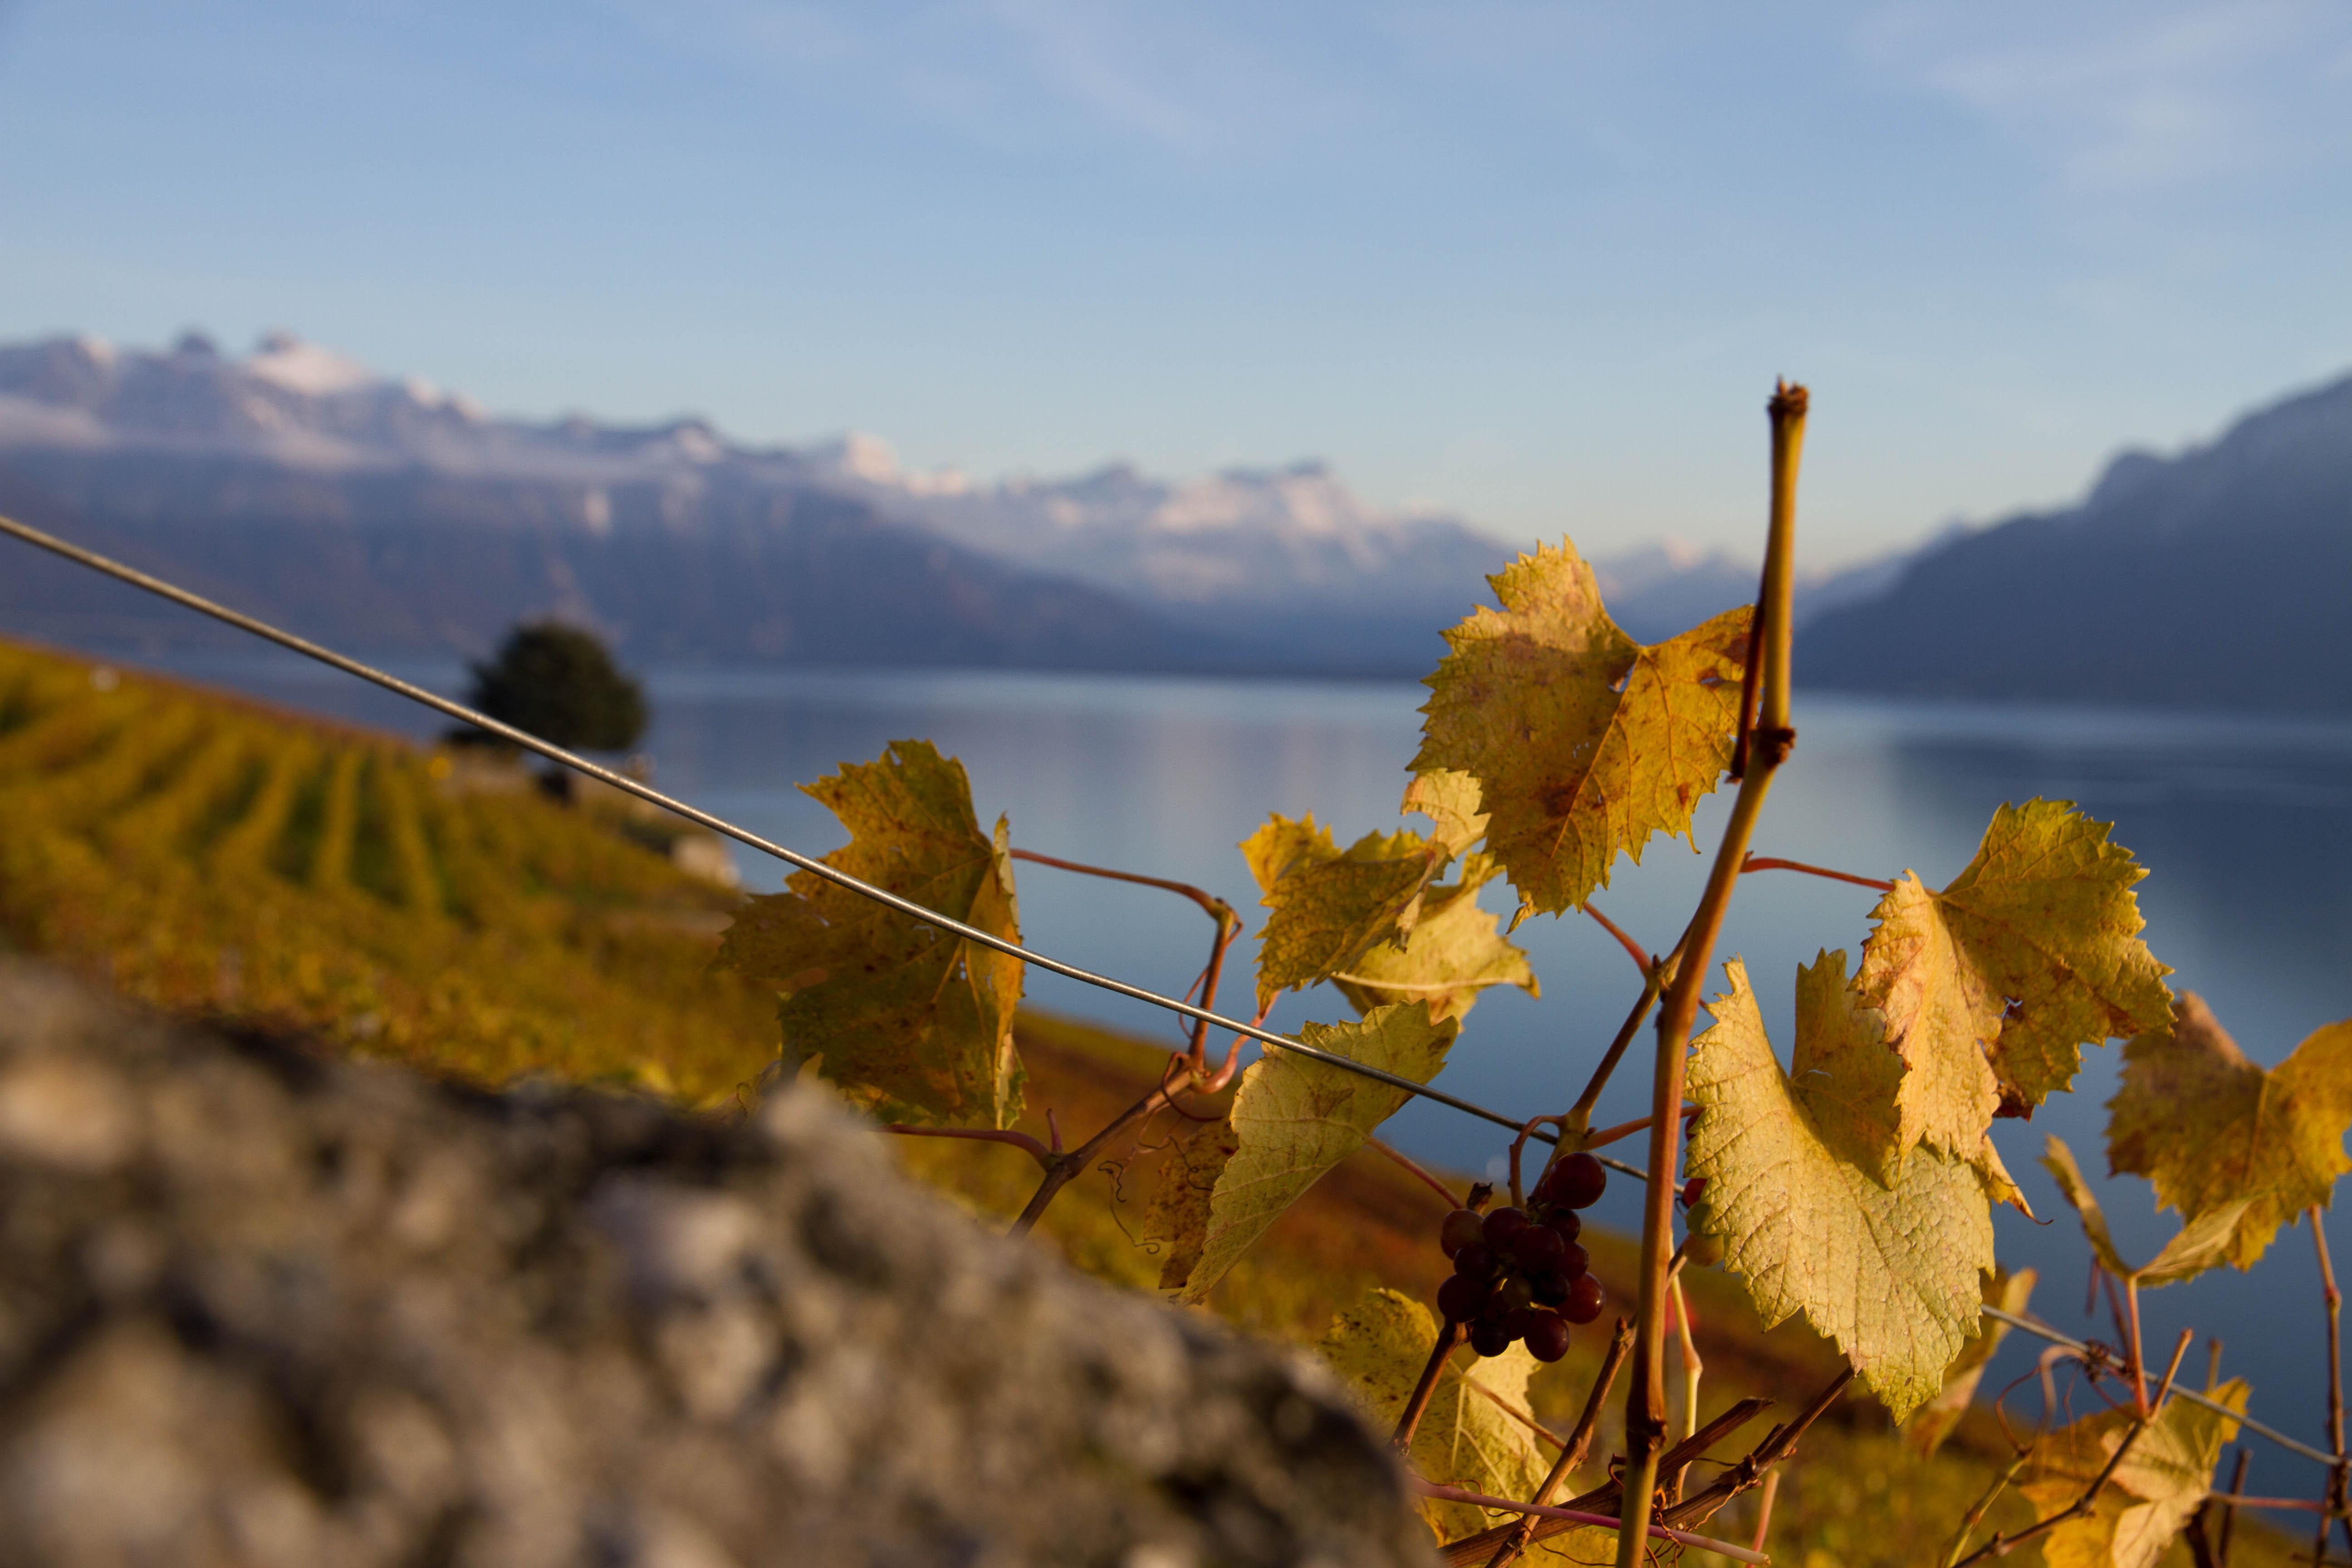 Wine Stay in Switzerland - Switzerland - Wine Regions - 1